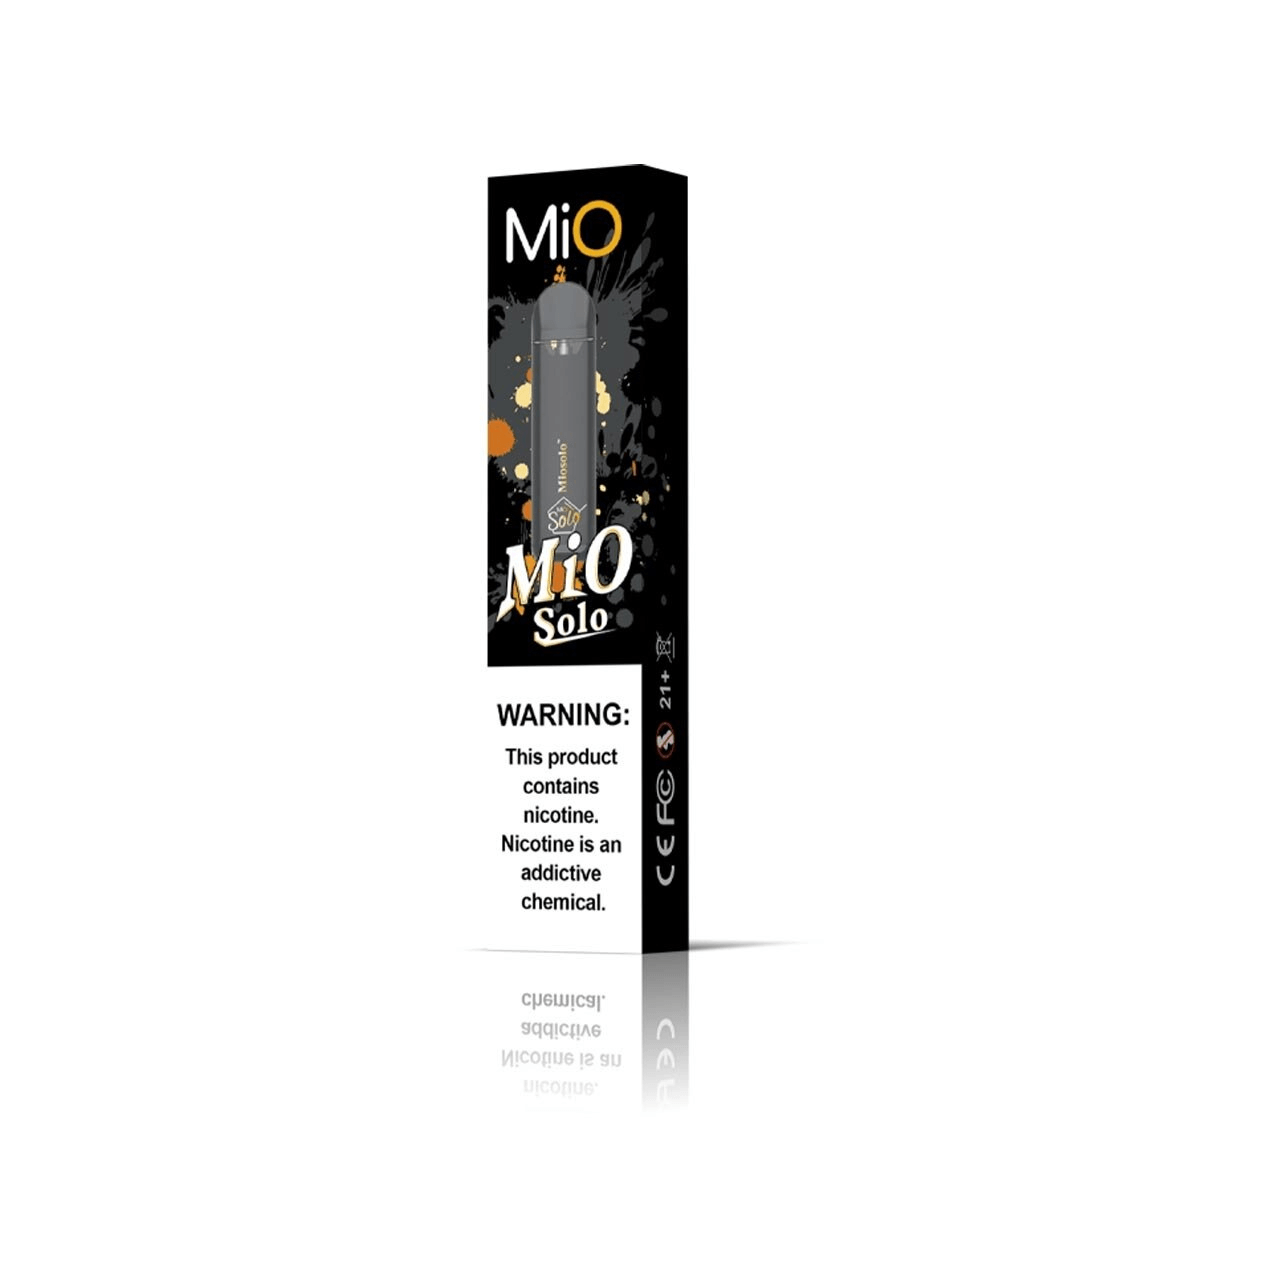 MiO Solo Pod Kits